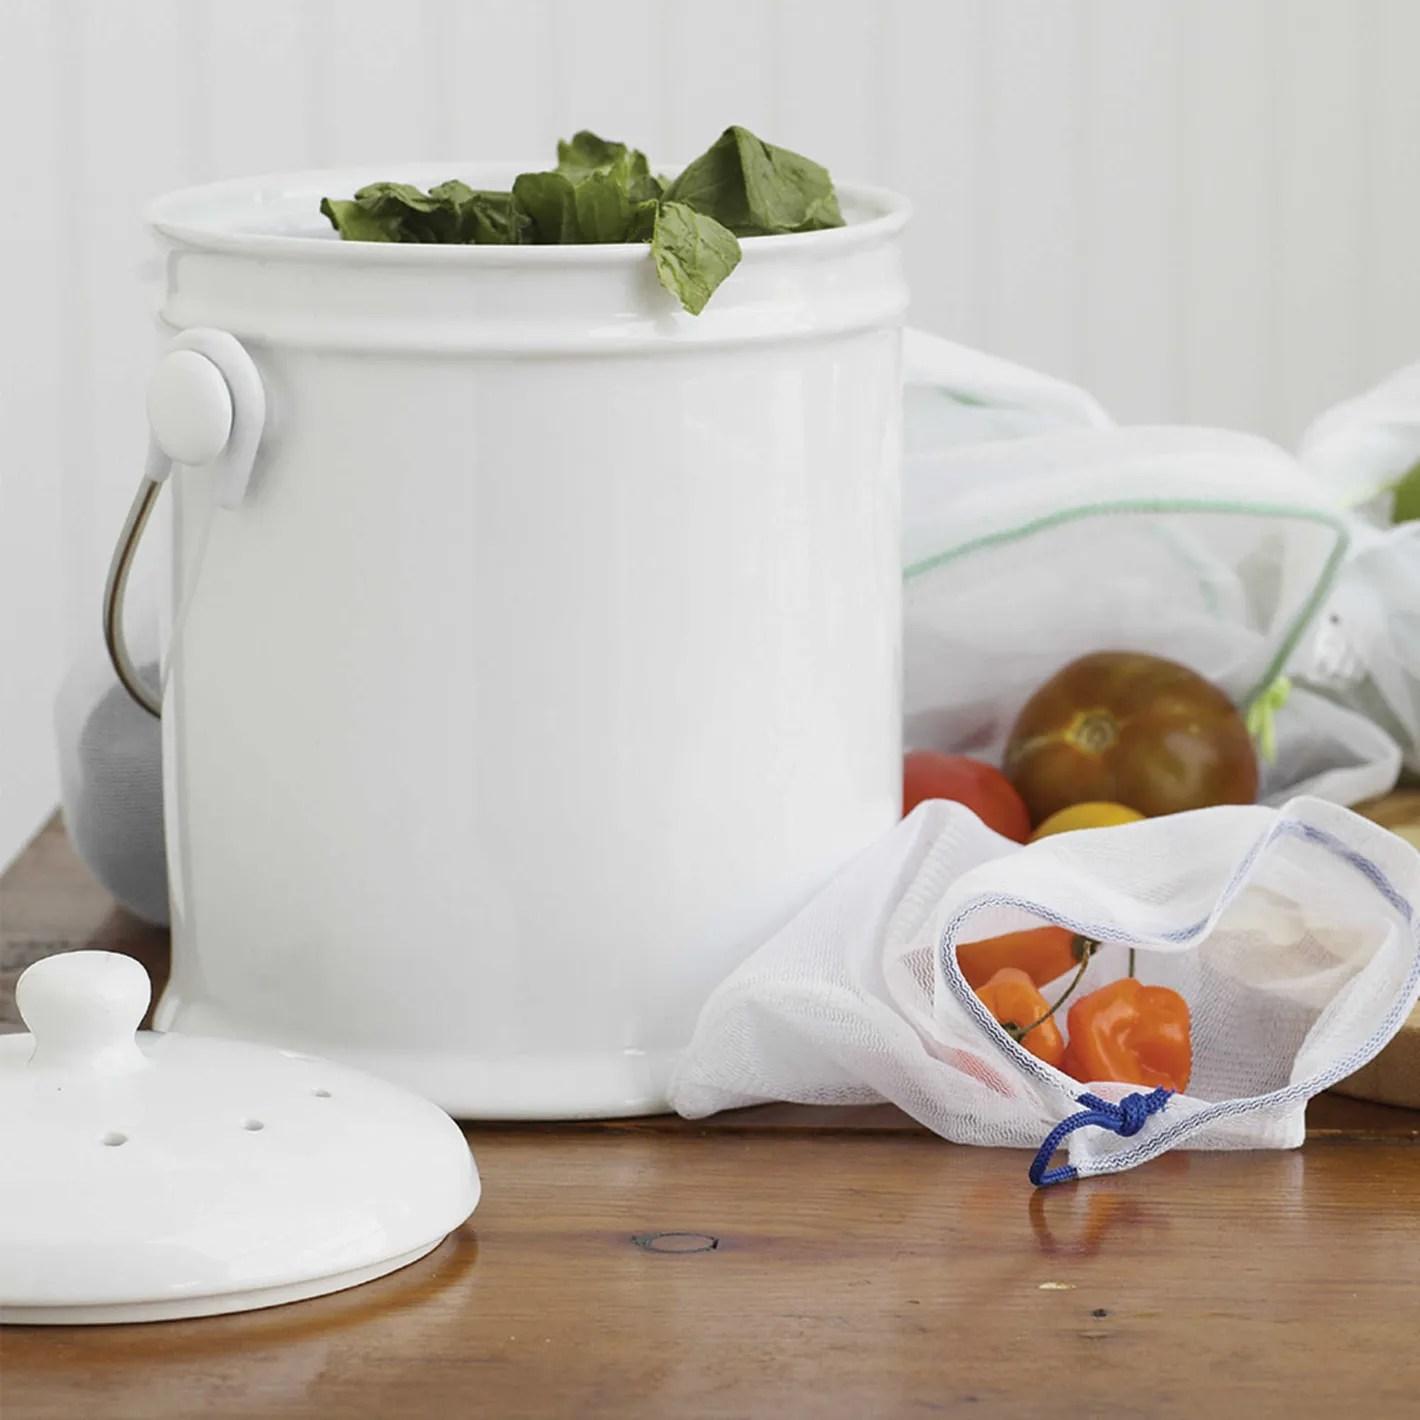 compost bin for kitchen mason jar lights 13 stylish bins your small 2018 natural home 1 gallon ceramic in white